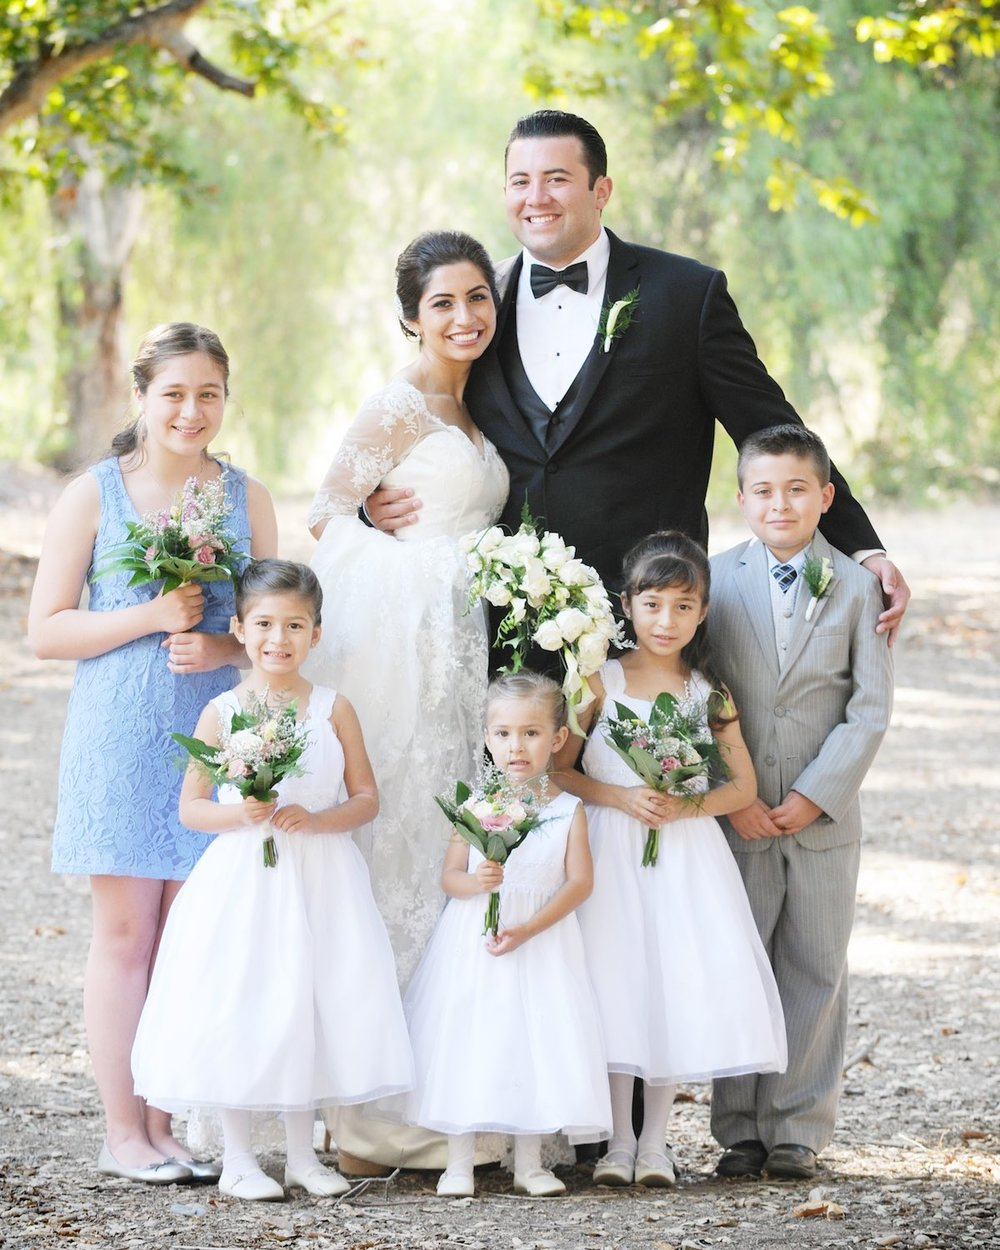 oc-wedding-michal-pfeil-07.jpg